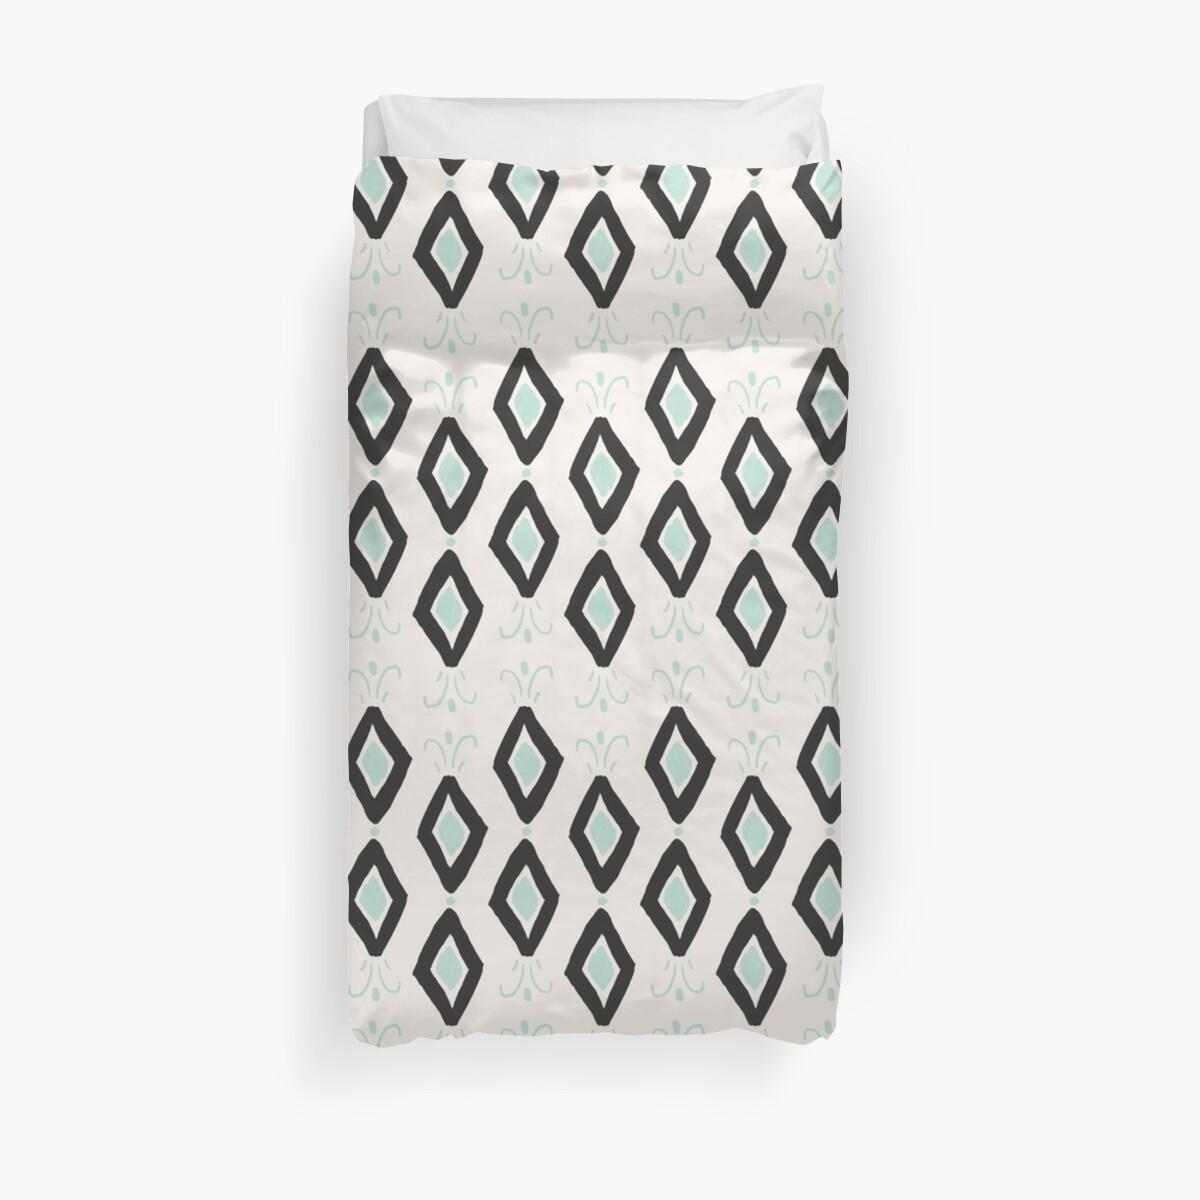 Bohemian Diamonds - Dark gray, light blue and cream pattern by allysonjohnson